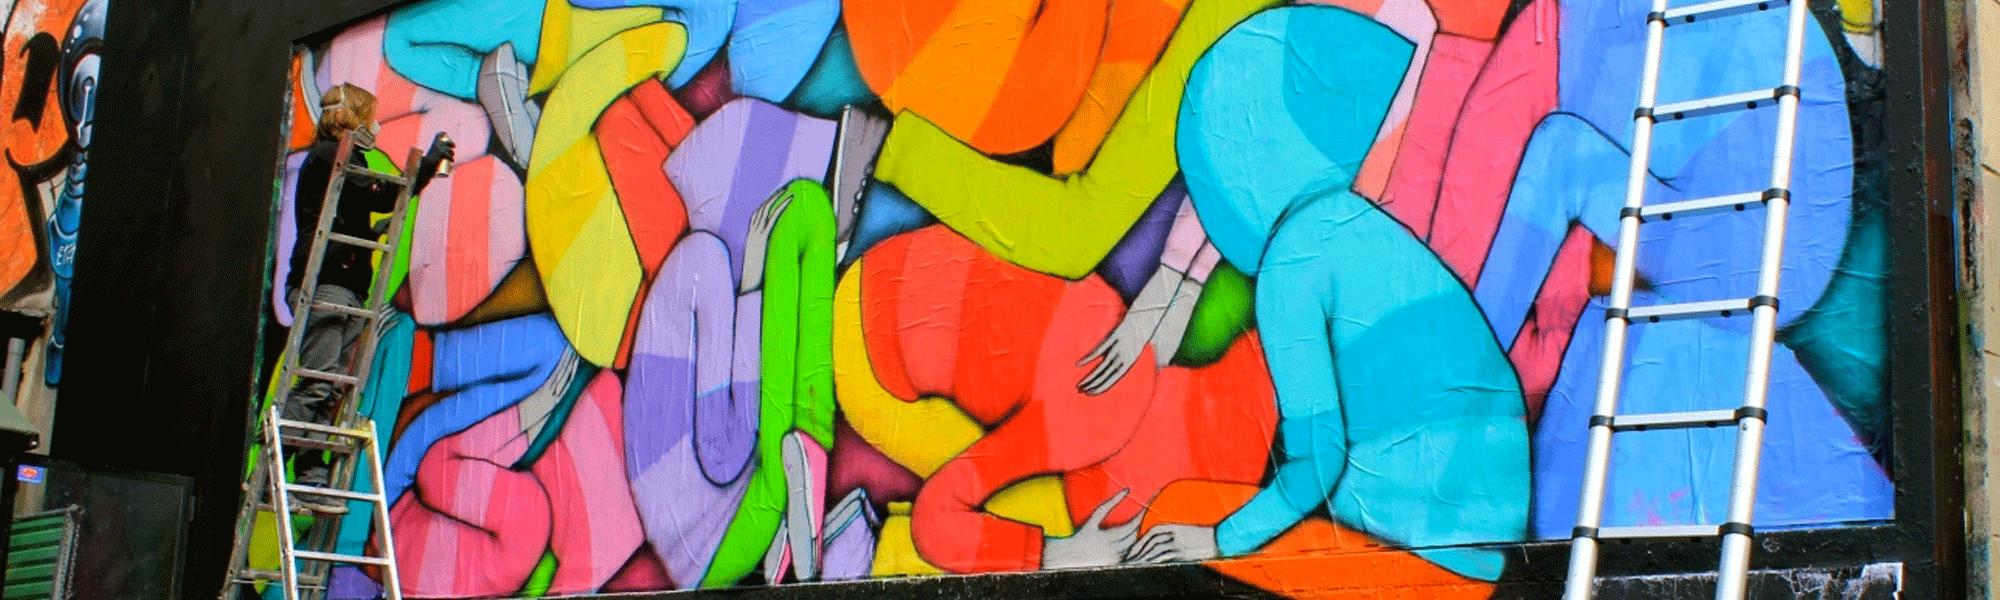 art urbain street art experience